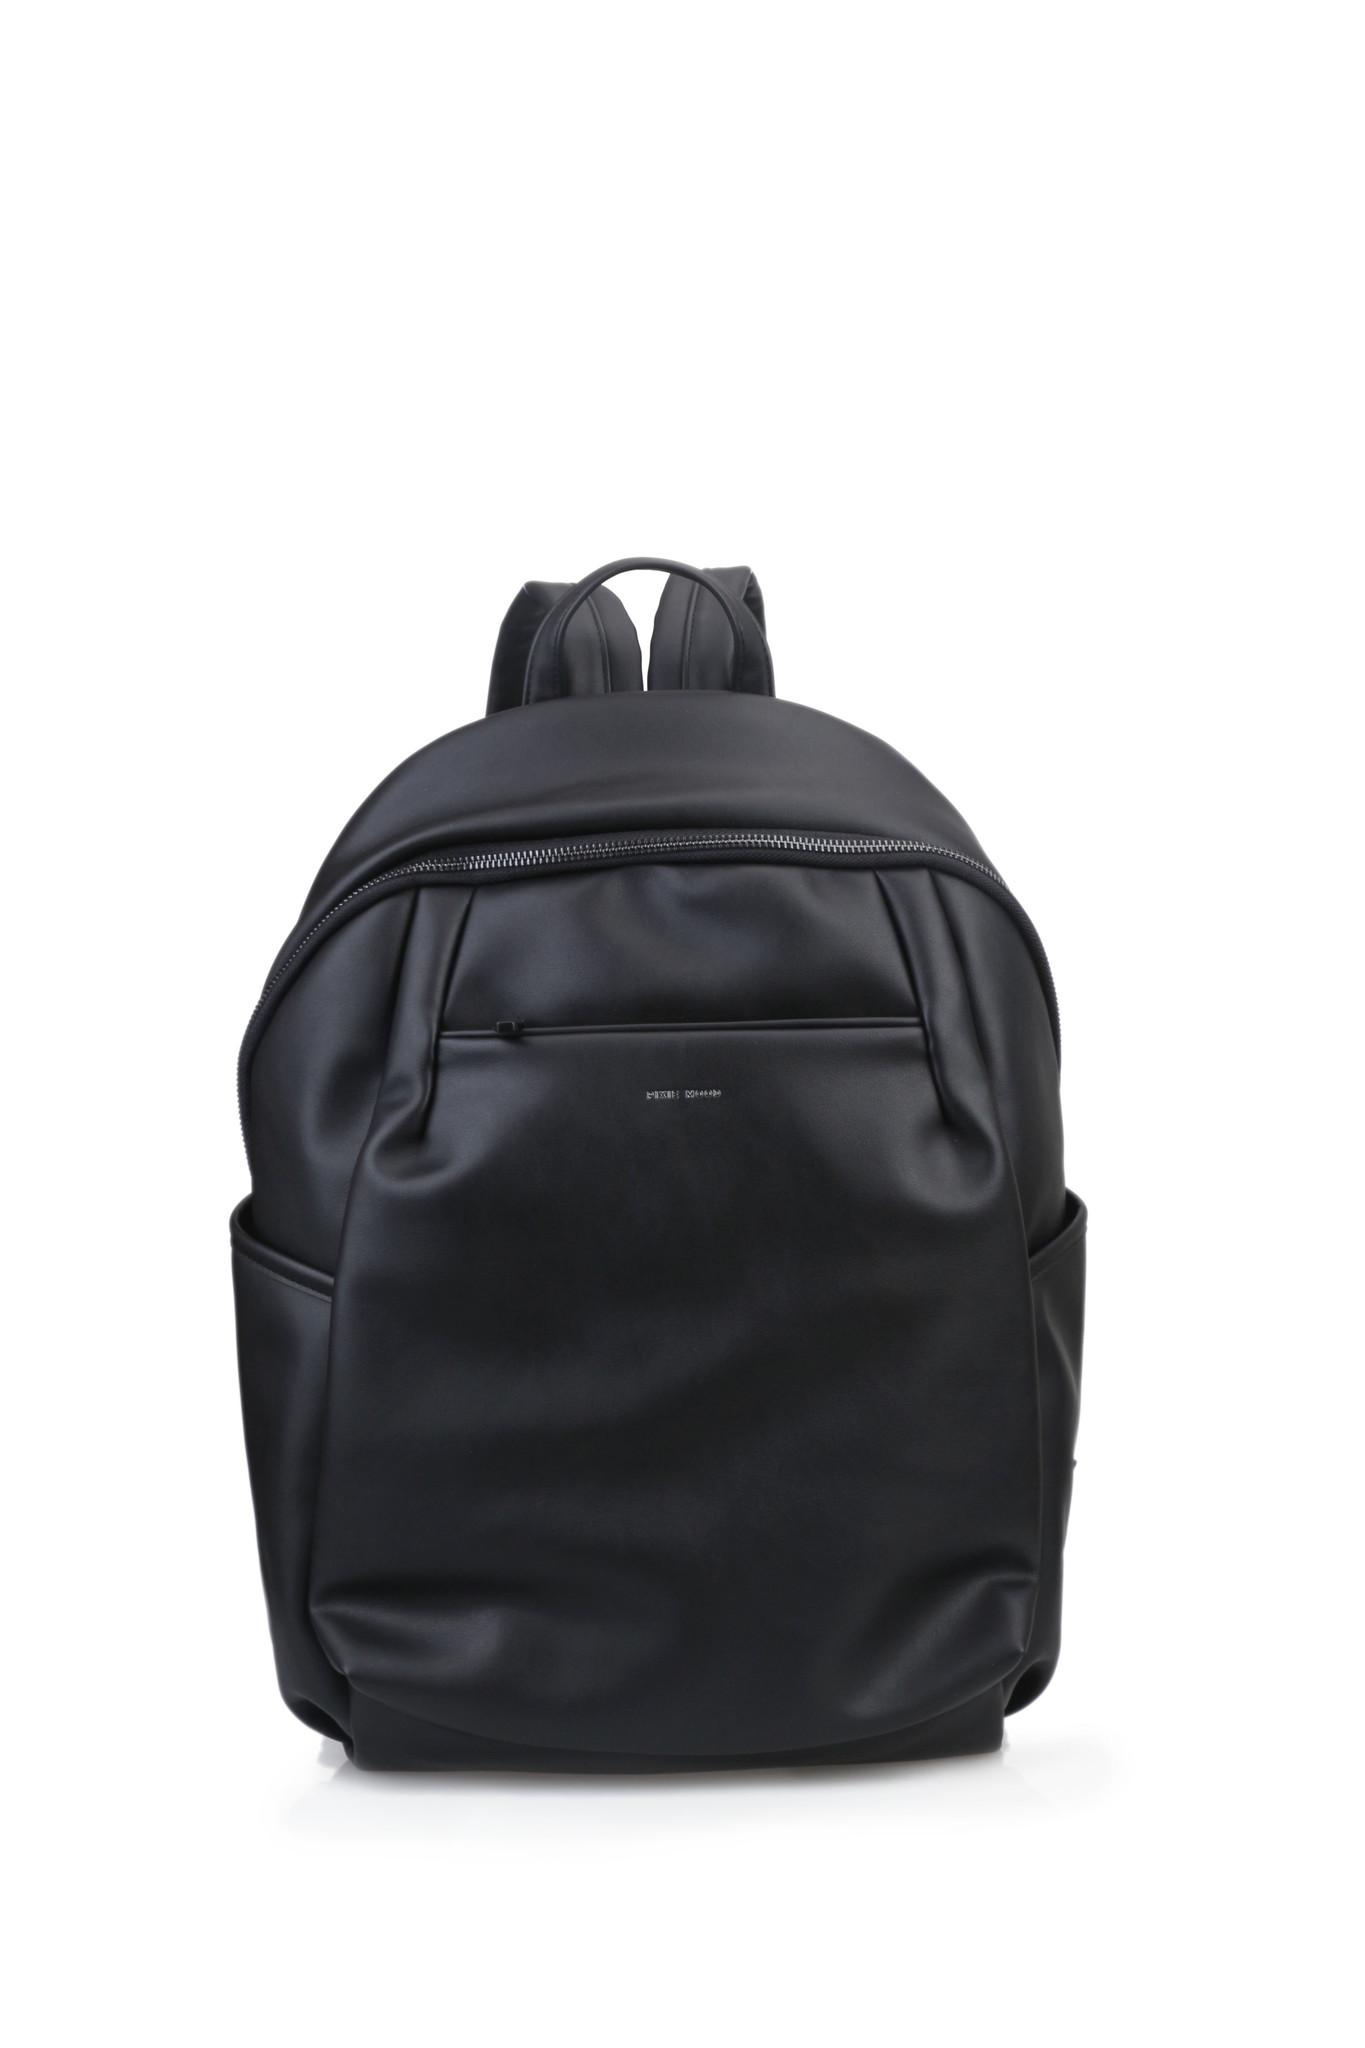 Pixie Mood Ashton TRAVEL Backpack